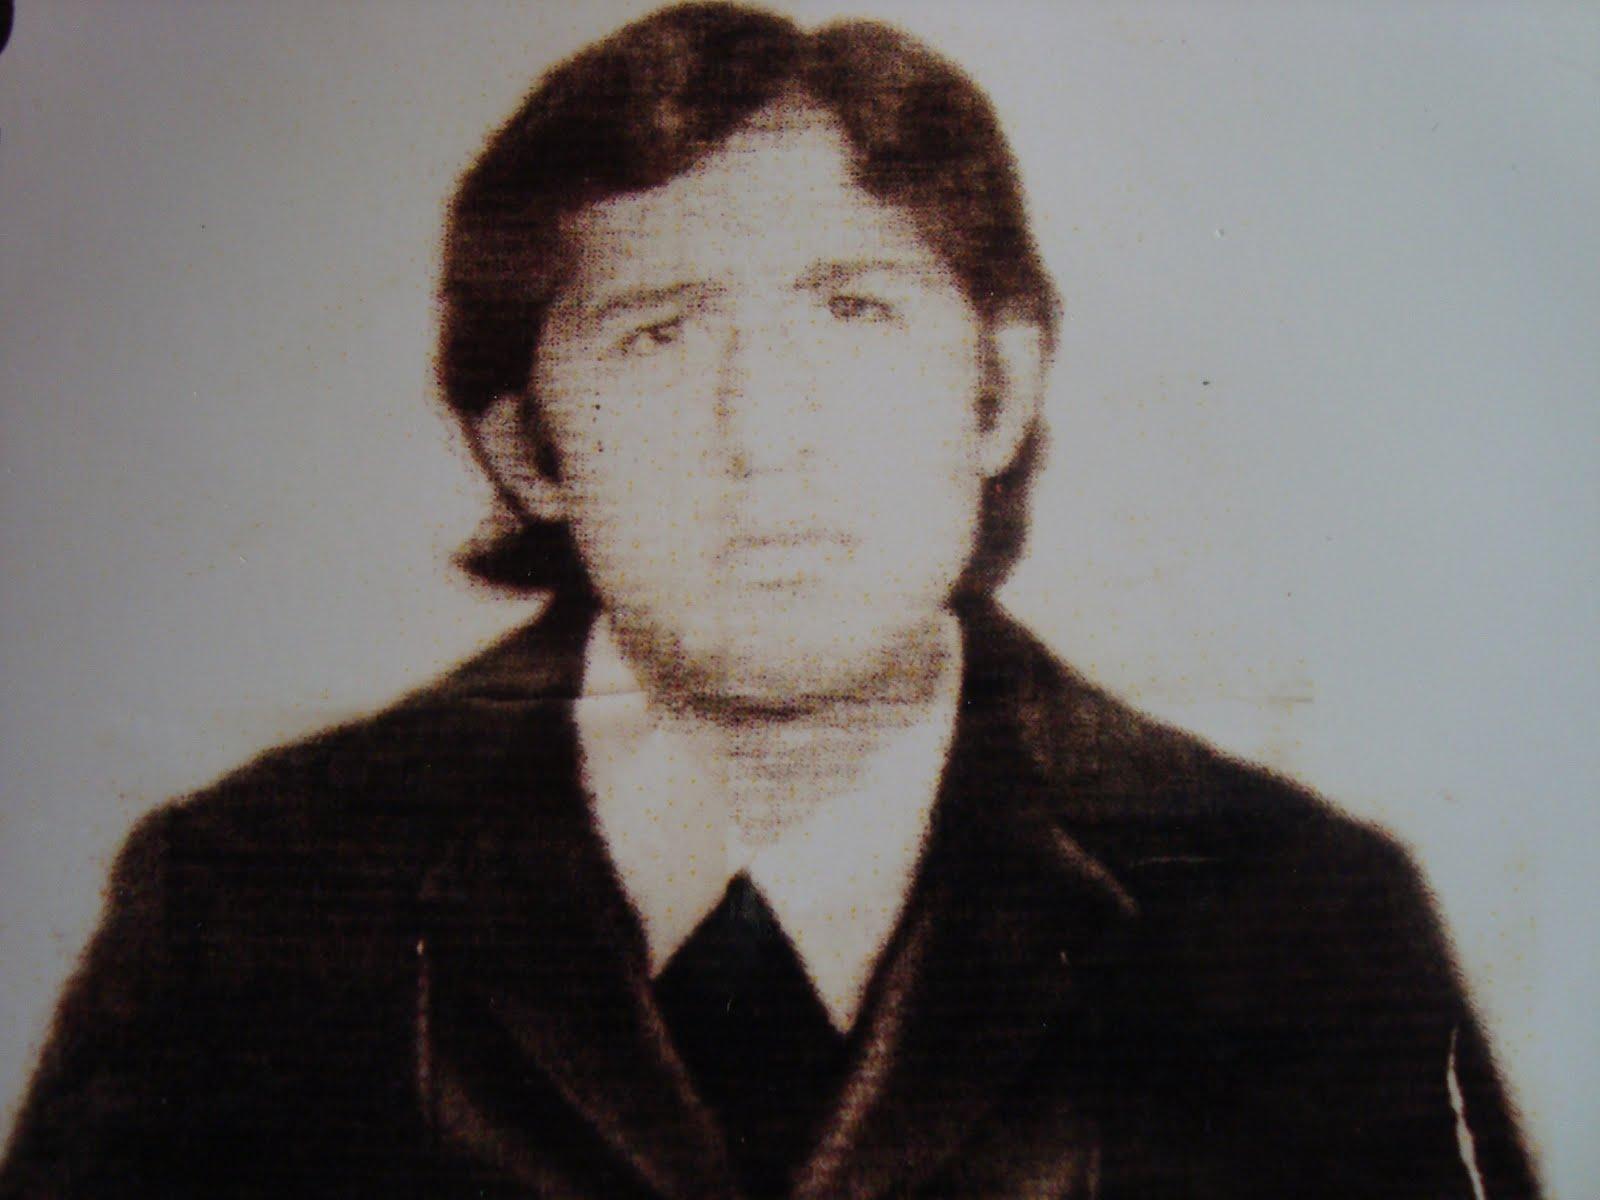 Jose Antonio CORTEZ